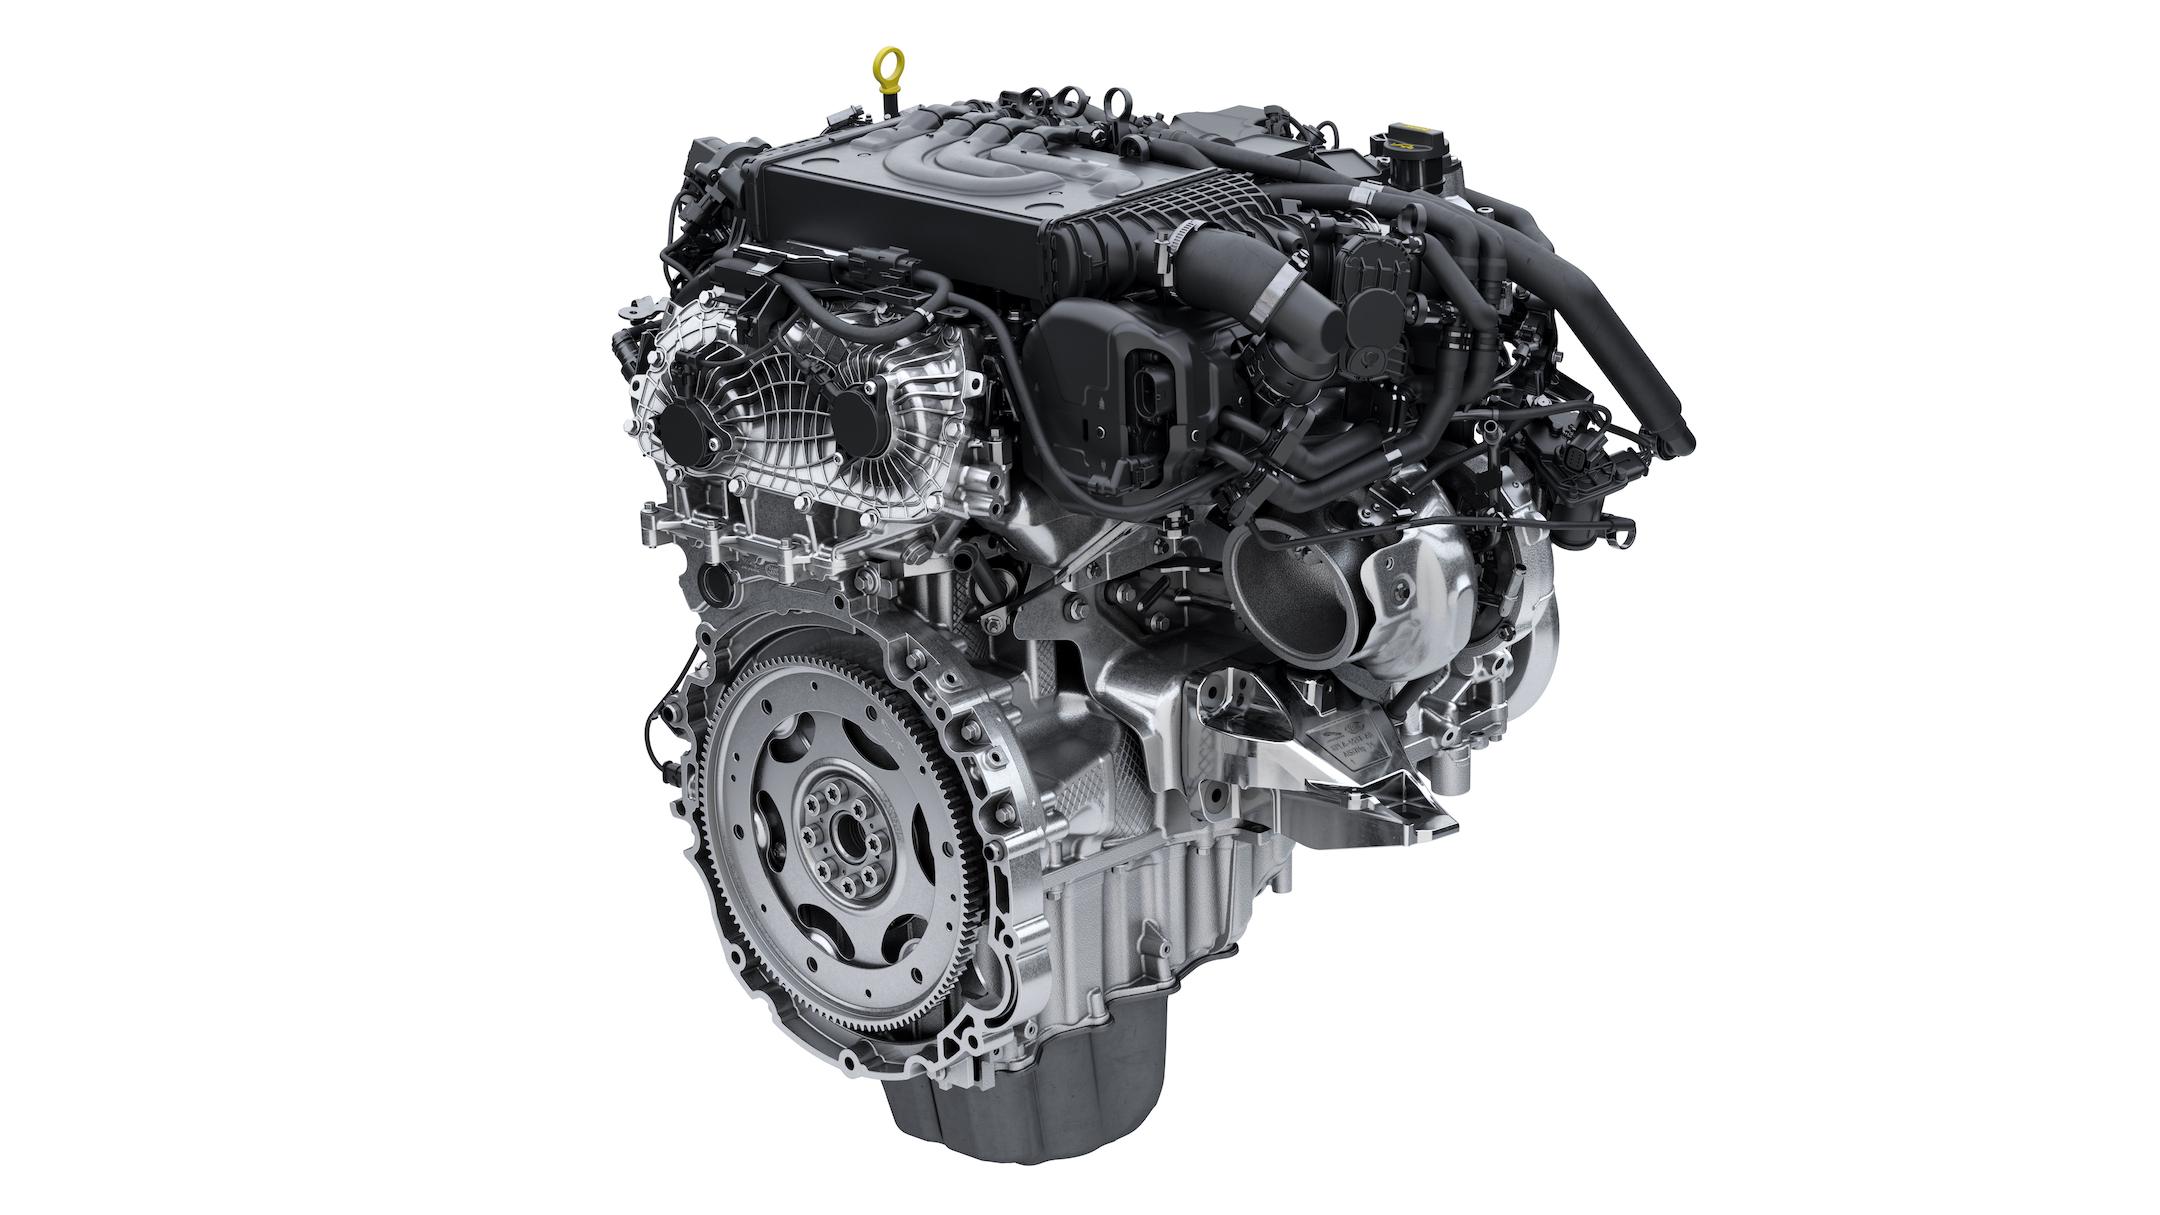 Range Rover Sport - Ingenium six-cylinder gasoline engine